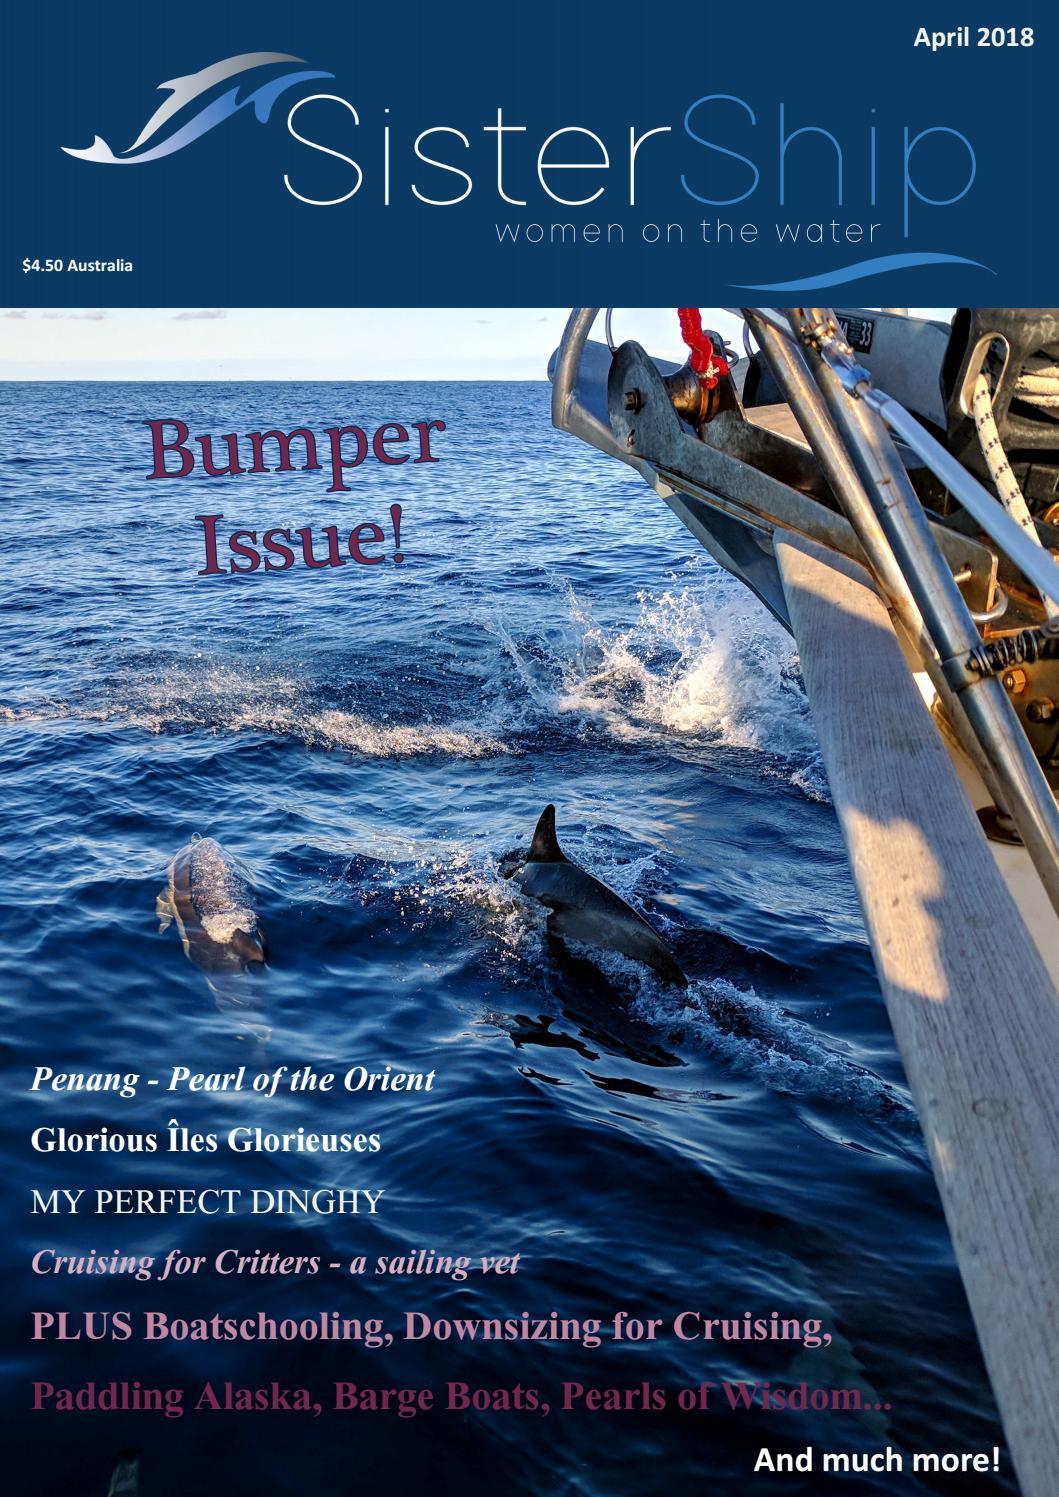 SisterShip Magazine April 2018 by SisterShipMagazine - issuu